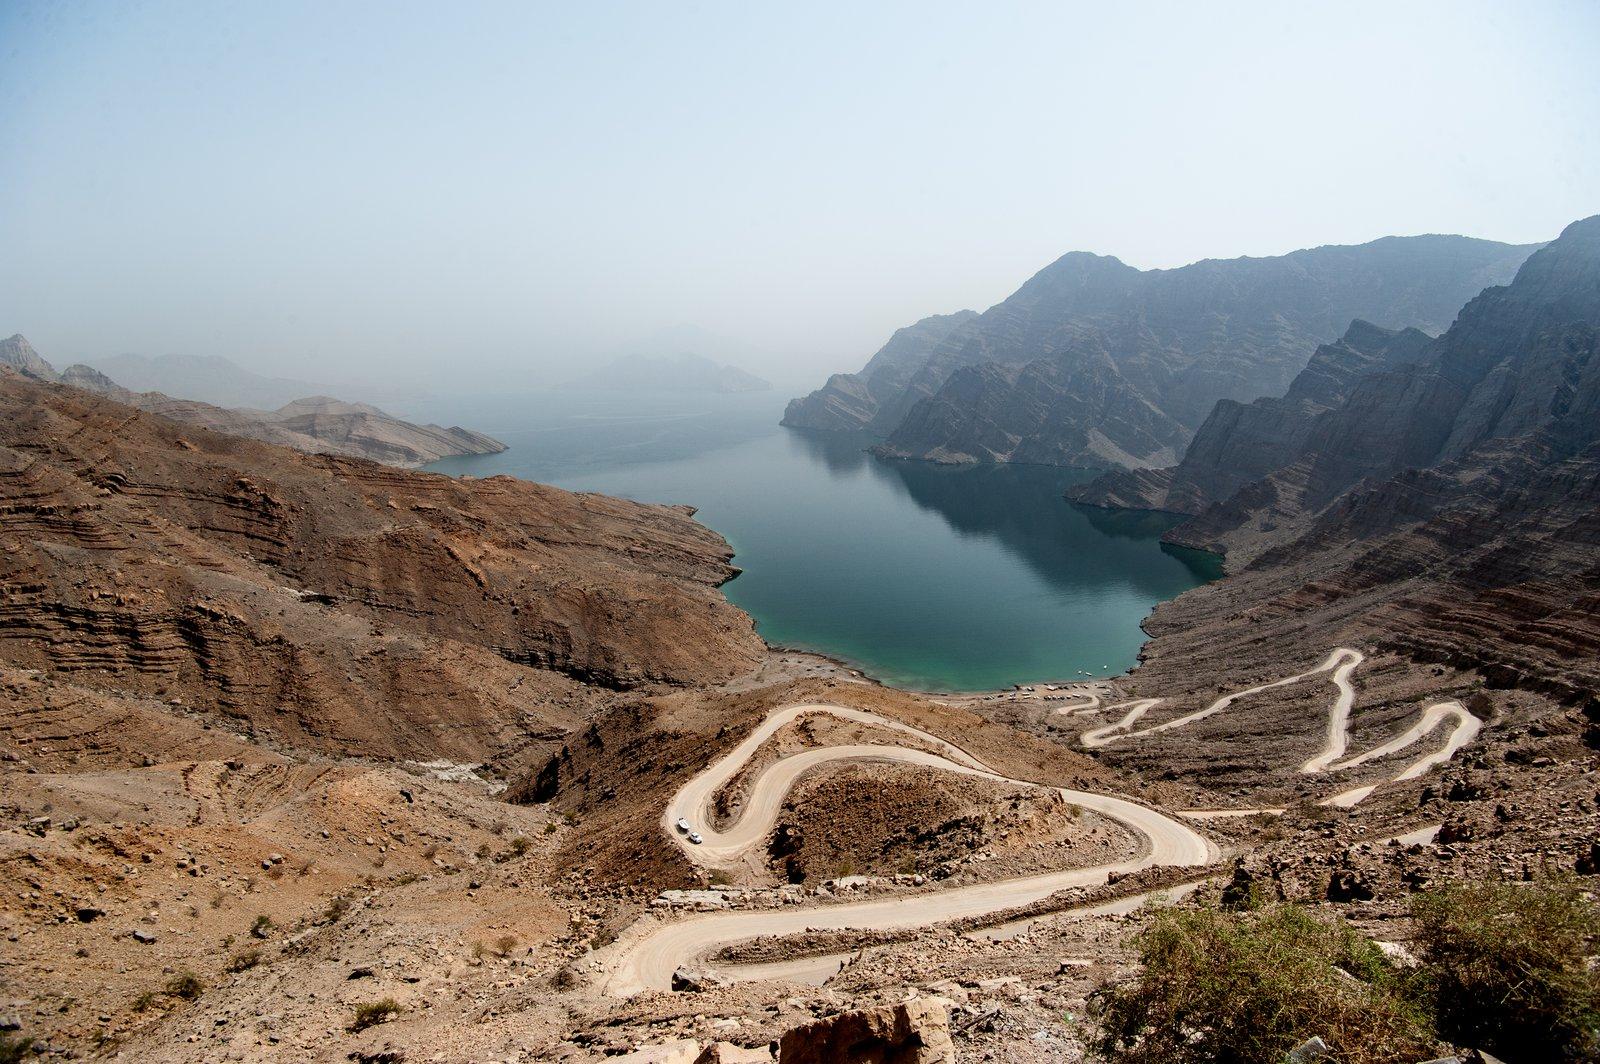 Winding road near Khasab, Oman